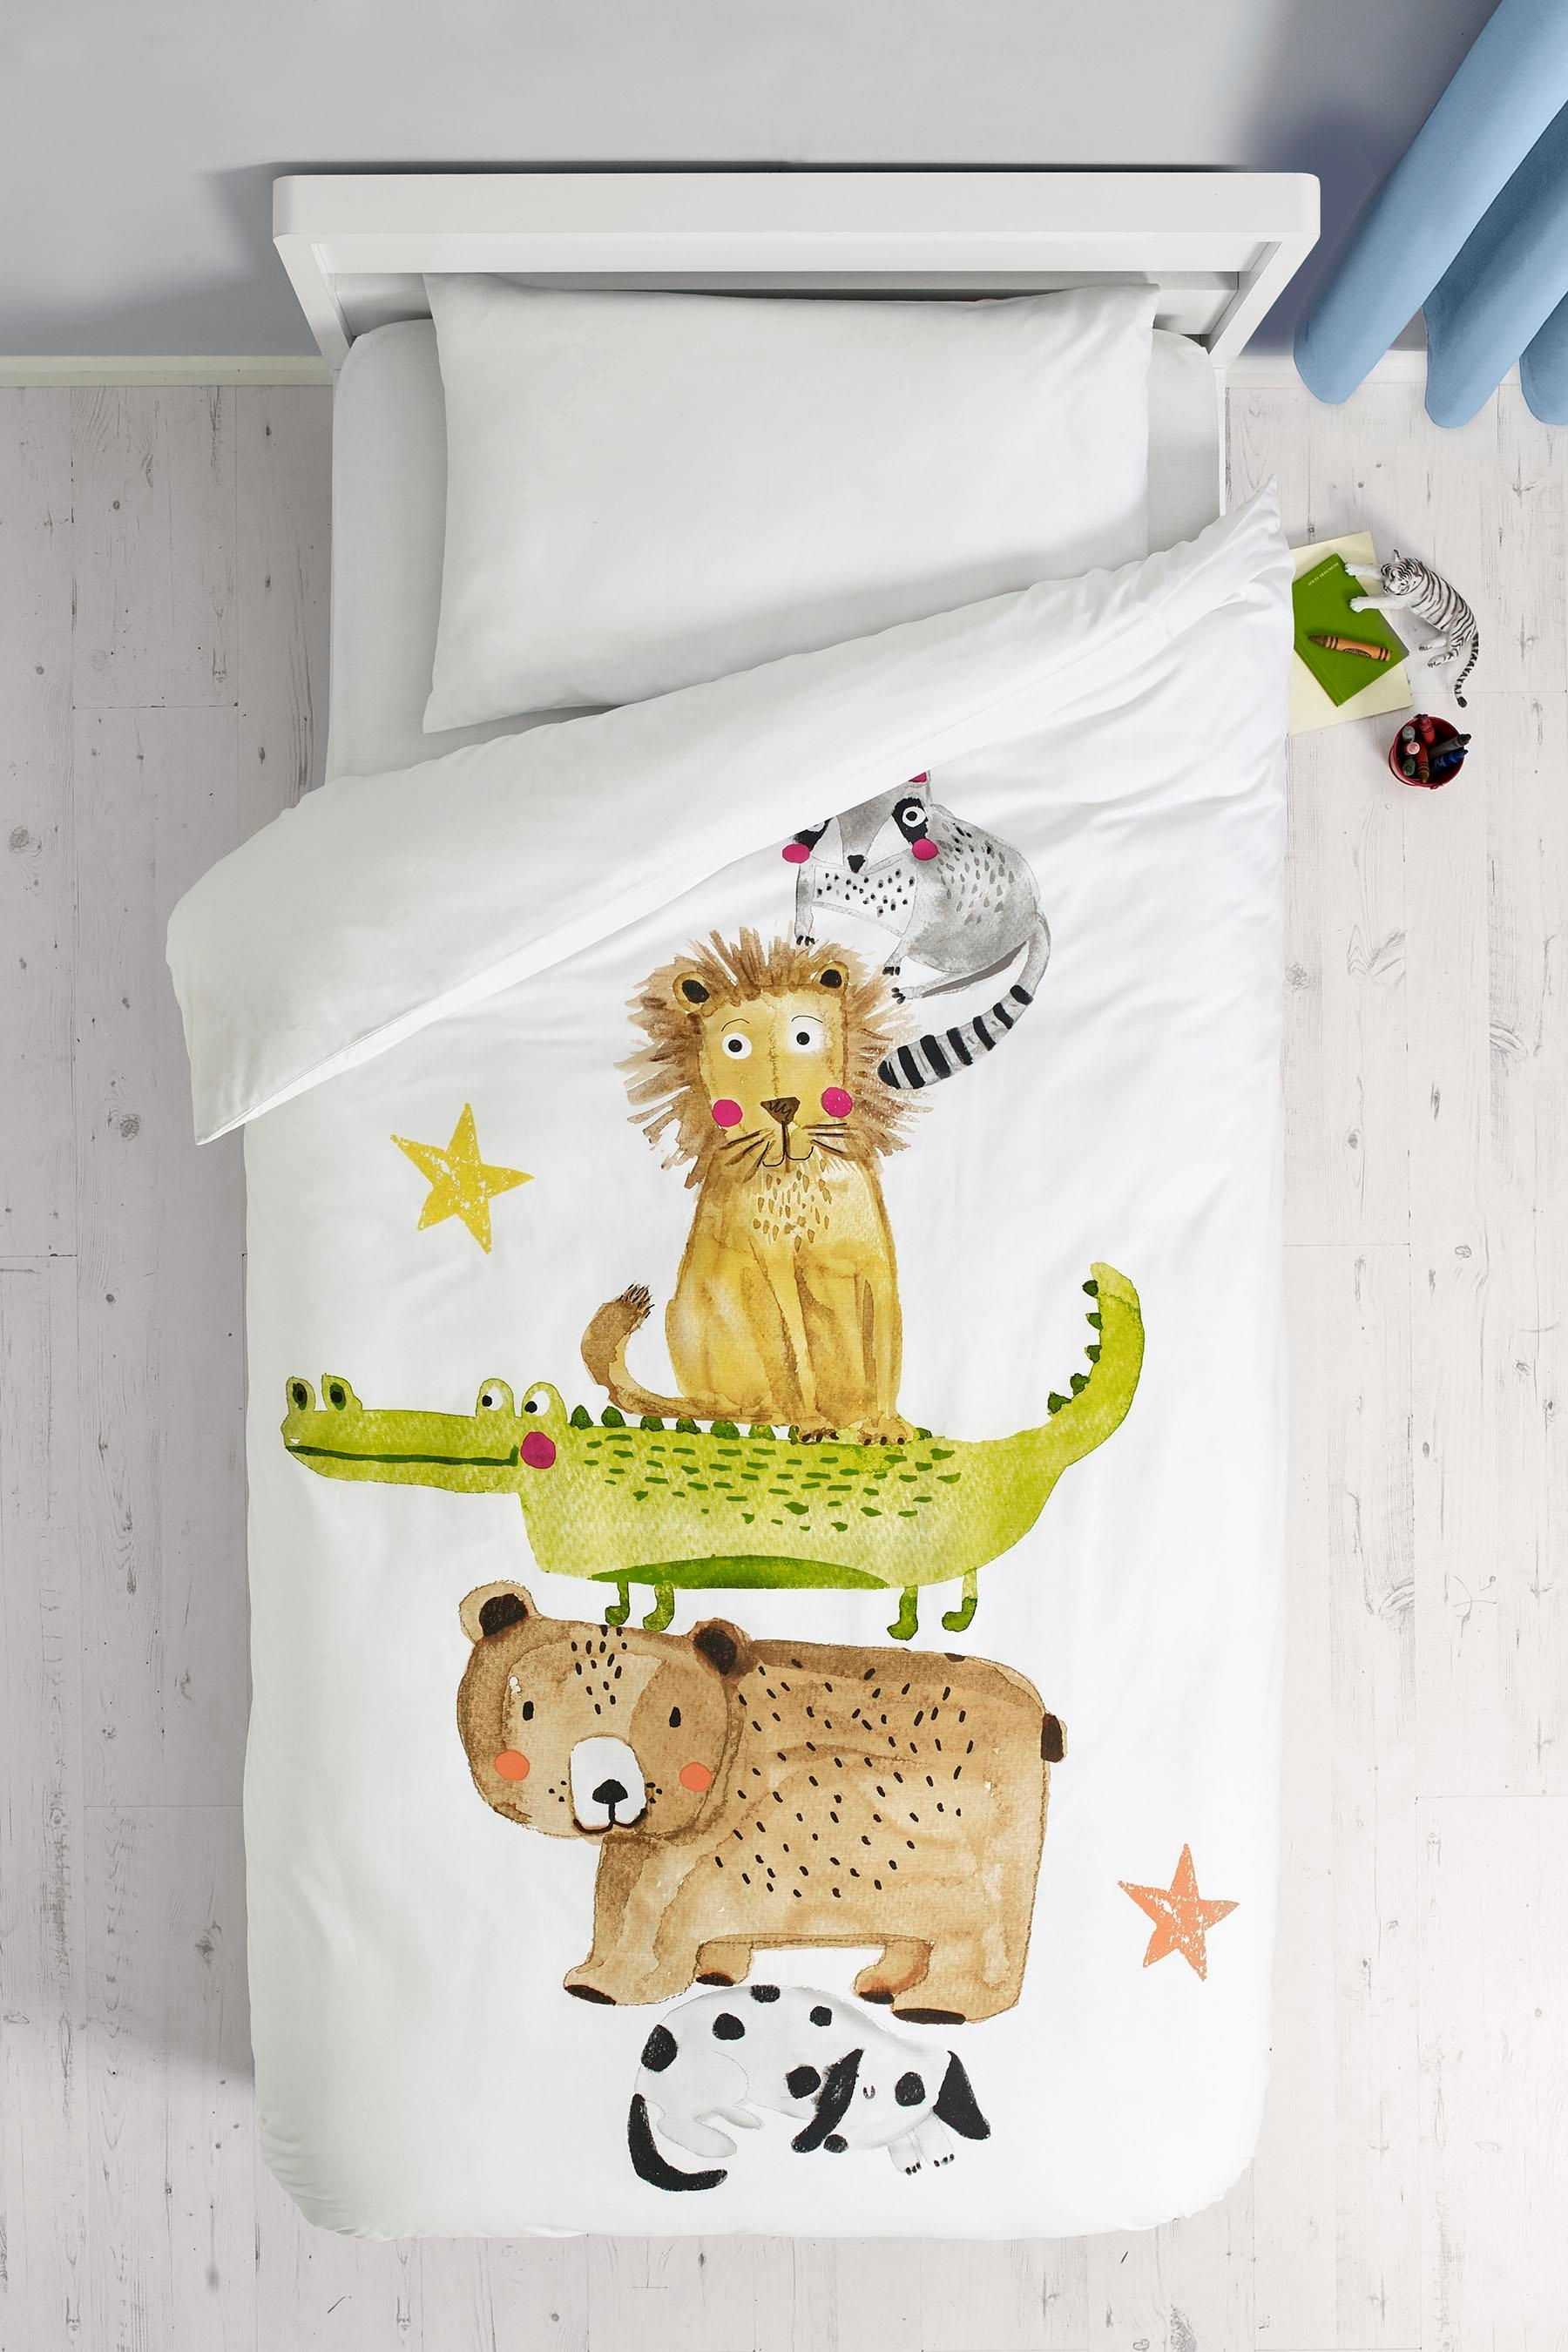 סט מצעים כיפי עם חיות בNext Best duvet covers, Animal